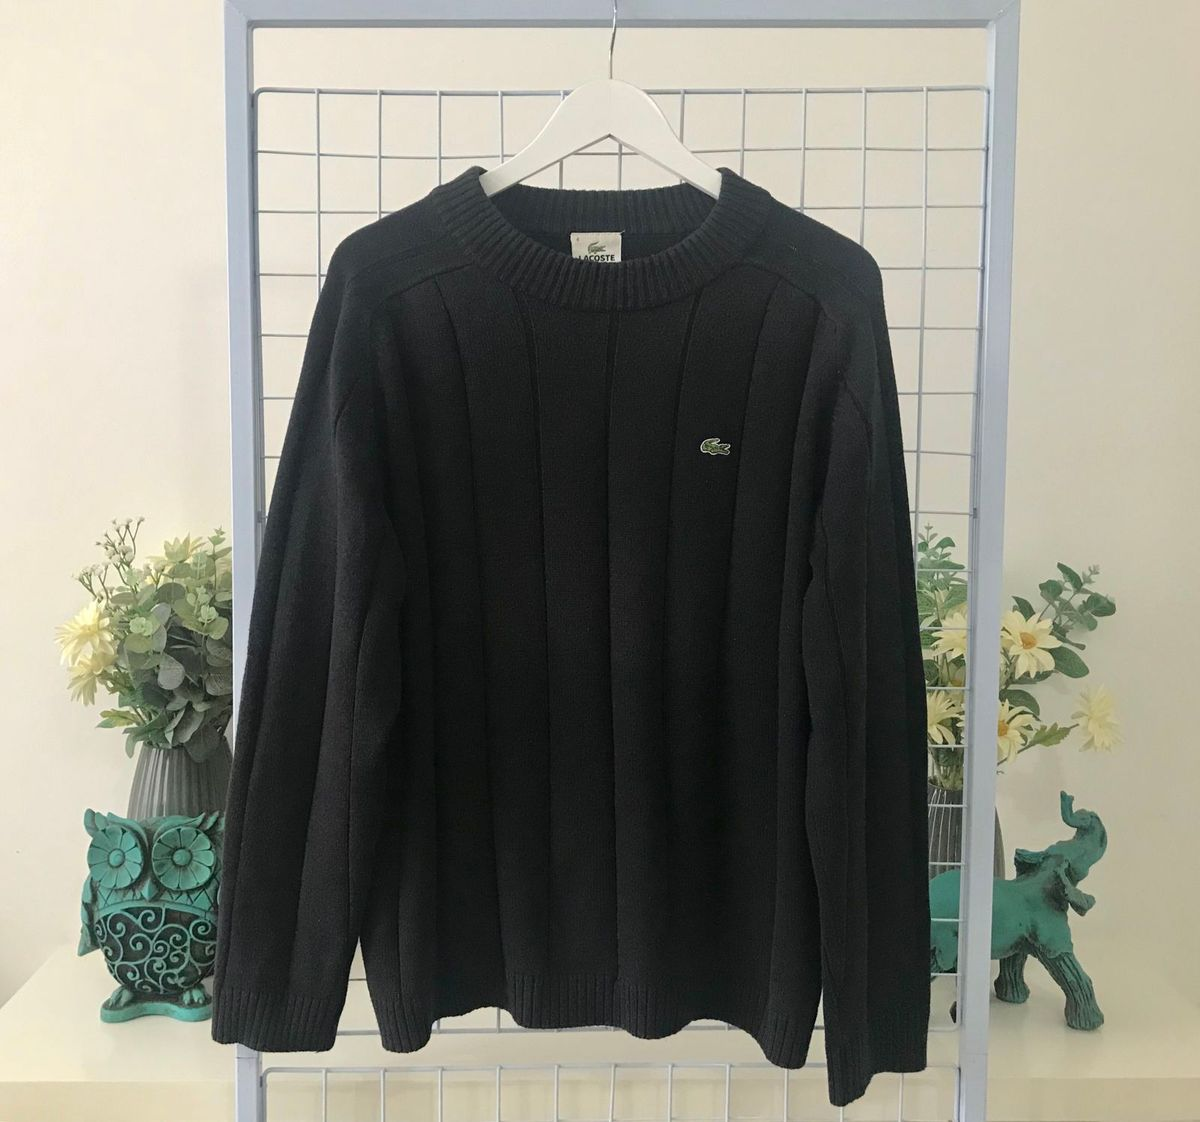 edd5aea45c54f blusa masculina frio lacoste cinza escuro - casacos lacoste